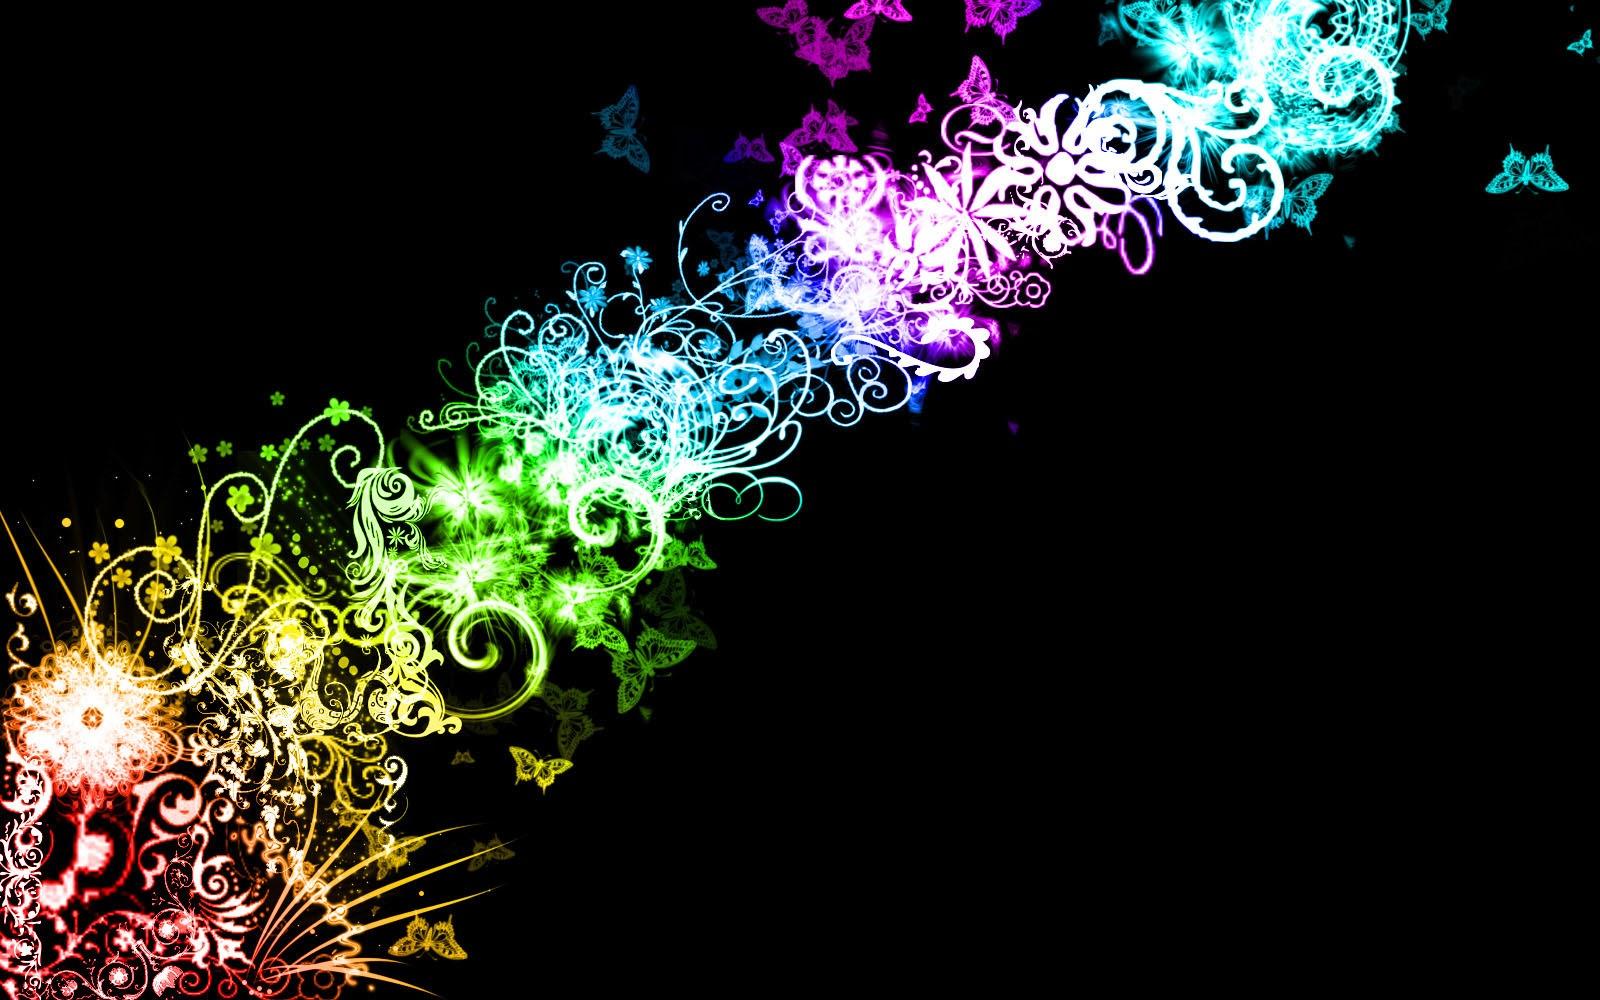 Digital Swirls Wallpaper